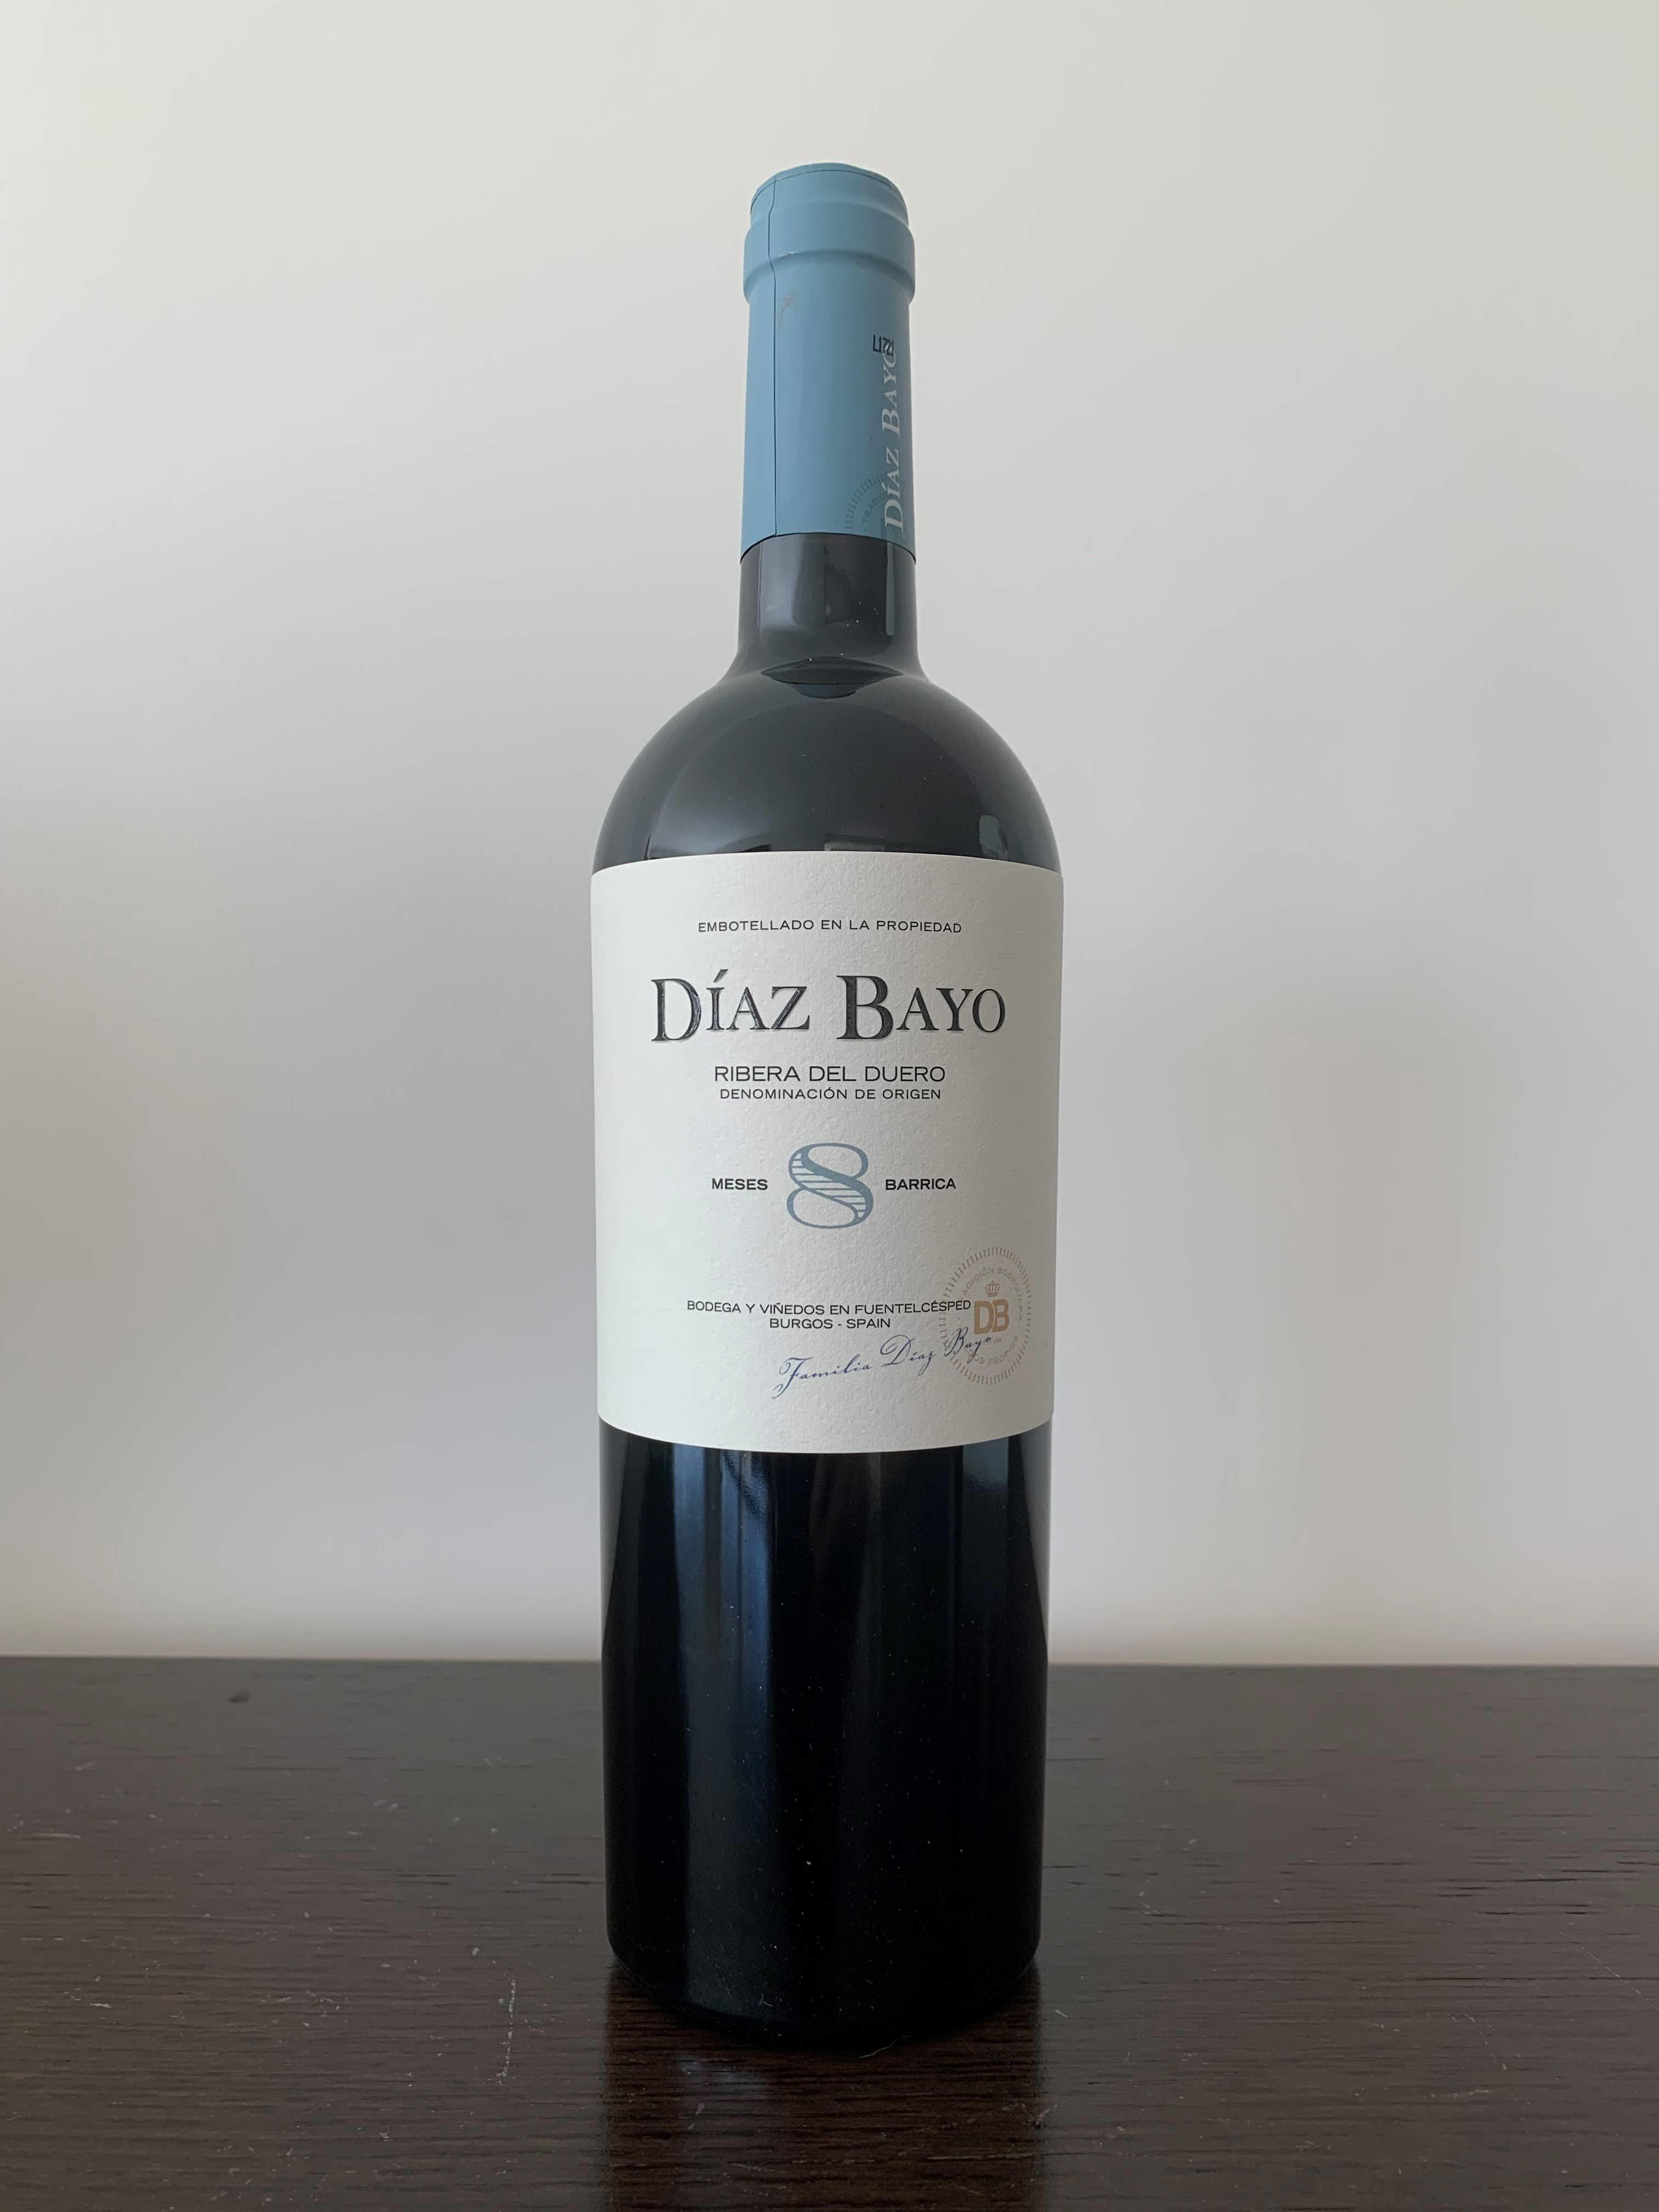 Diaz Bayo Roble 8